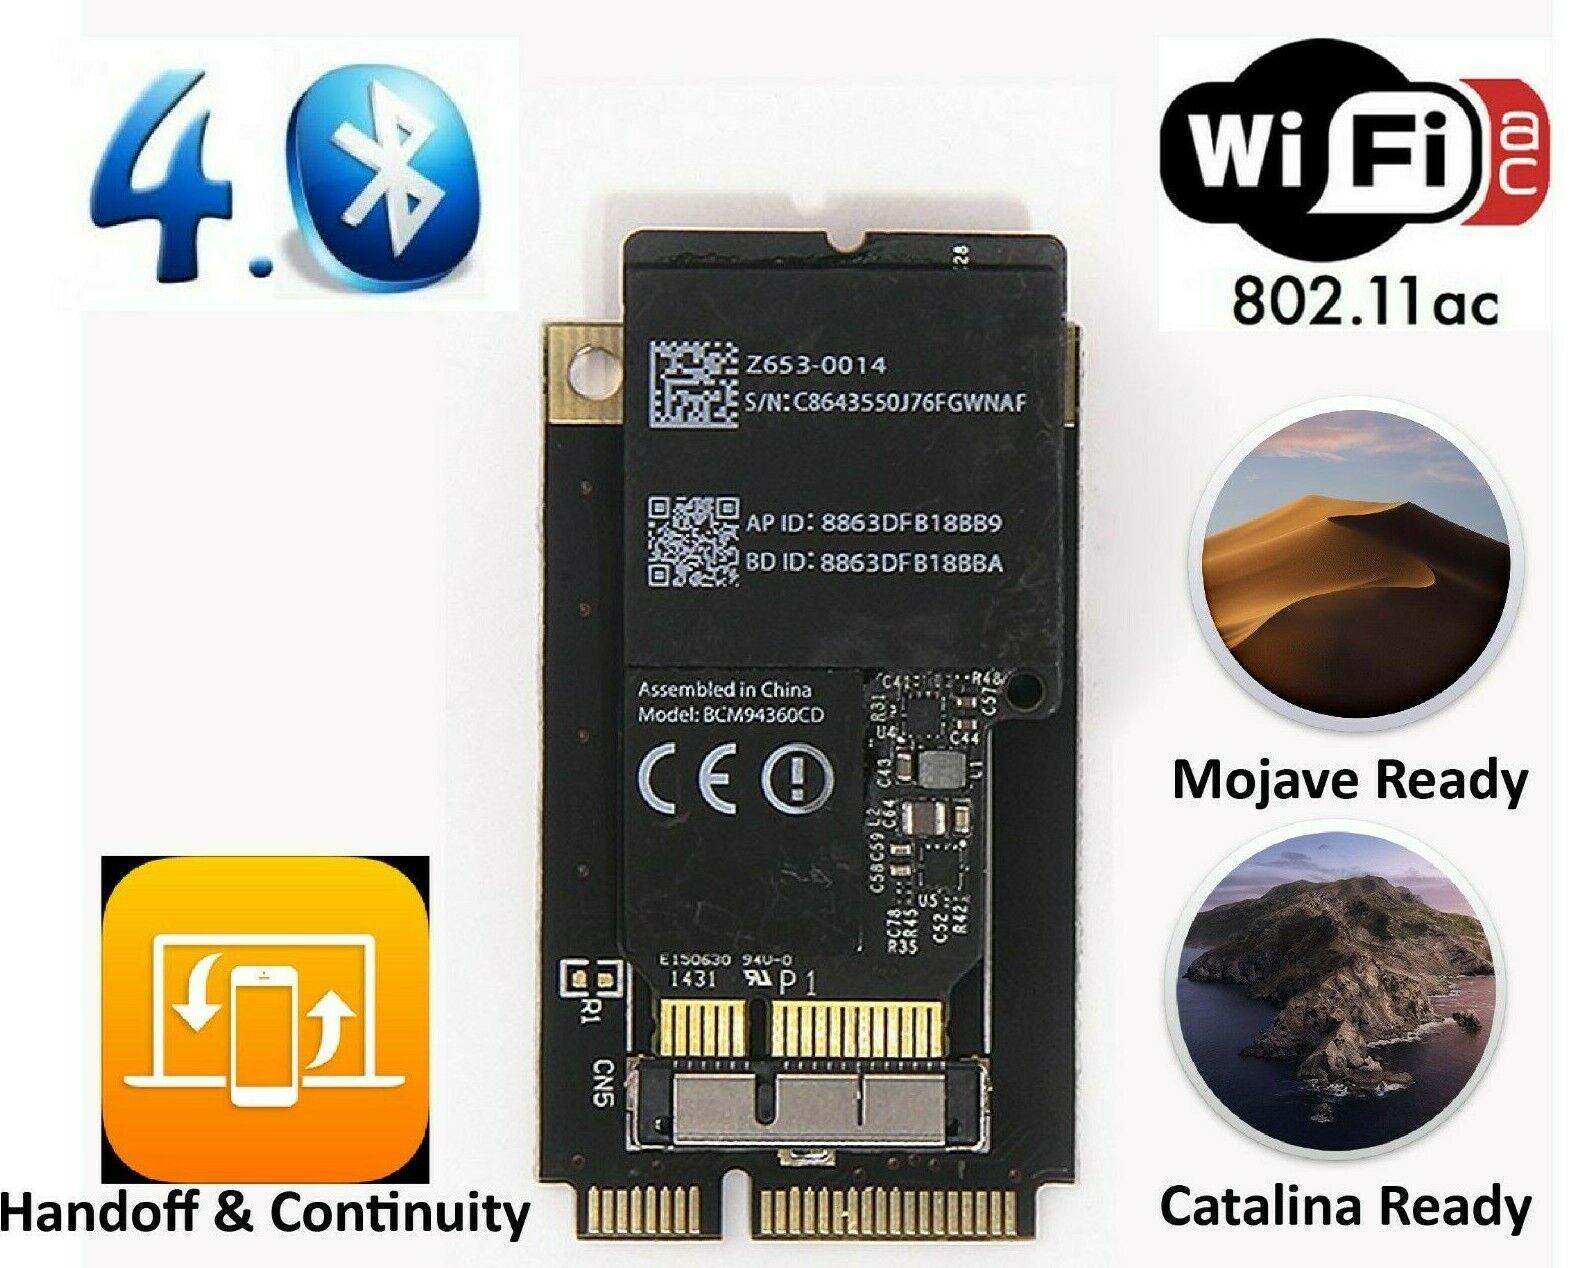 Mac Pro WiFi Bluetooth Upgrade Kit - 802.11 a/b/g/n/ac with Bluetooth 4.0 - USA